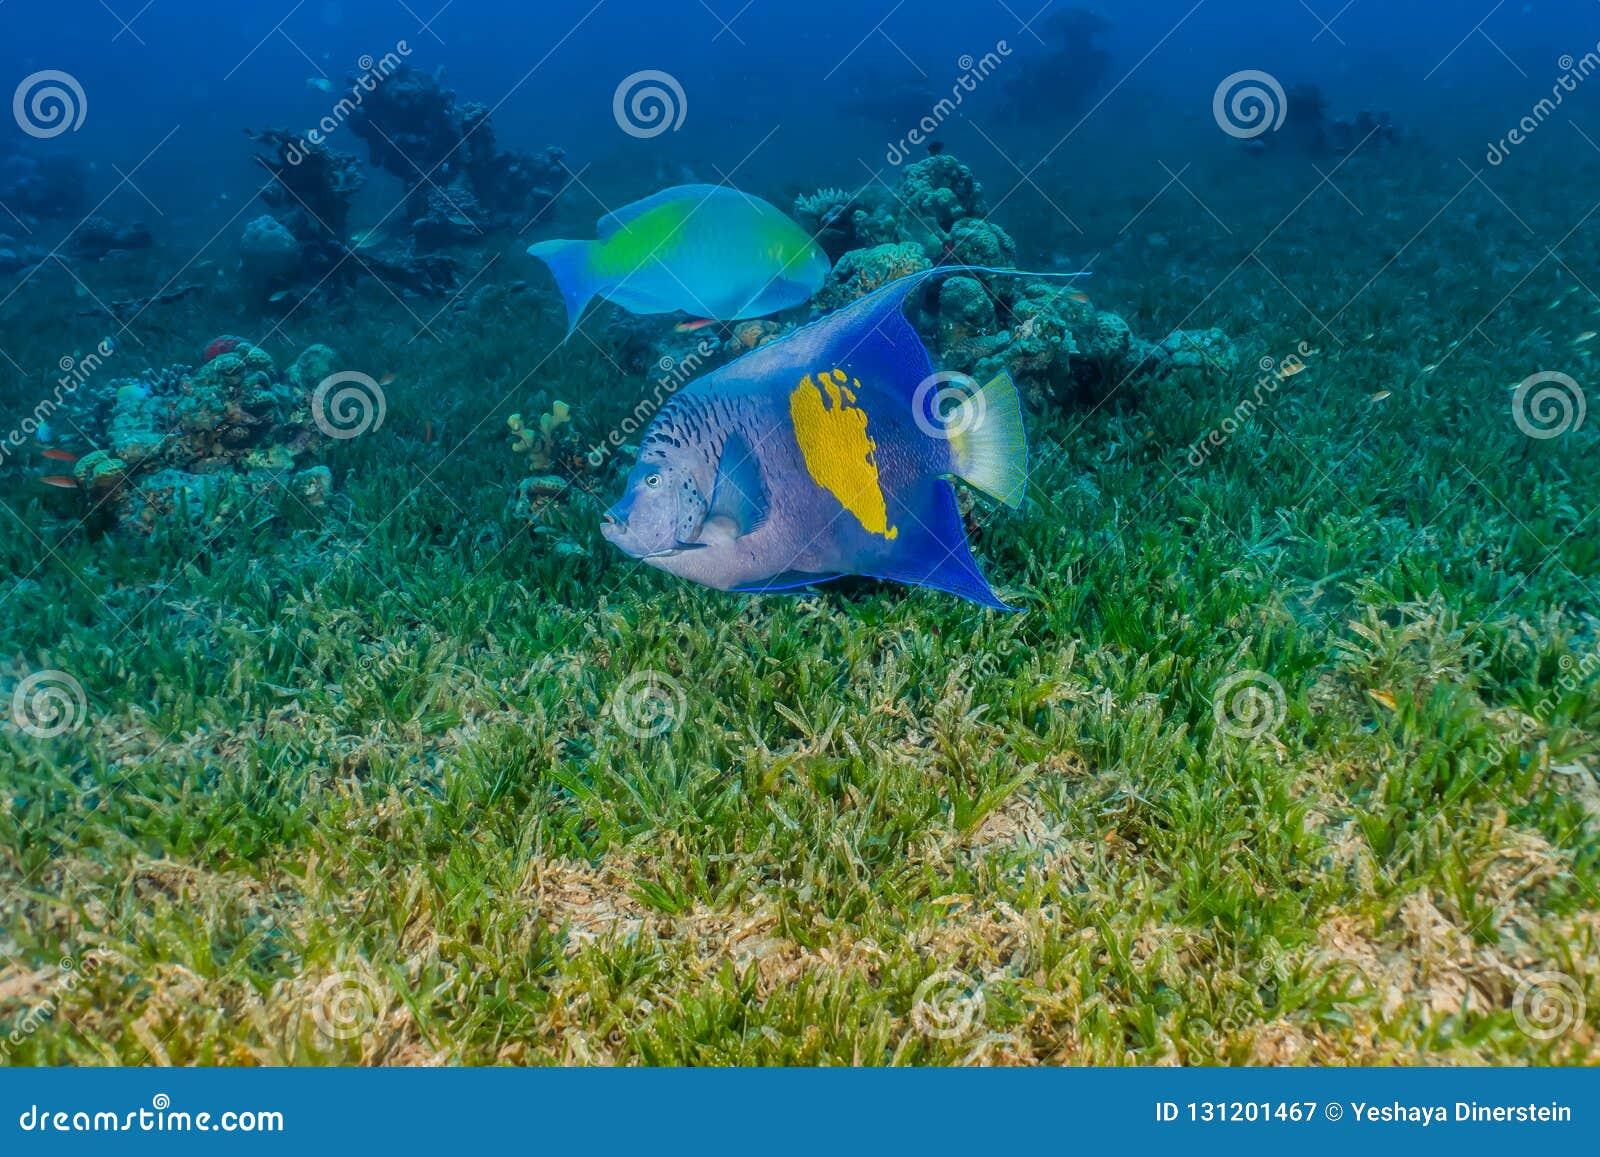 Amazing Fish swim in the Red Sea